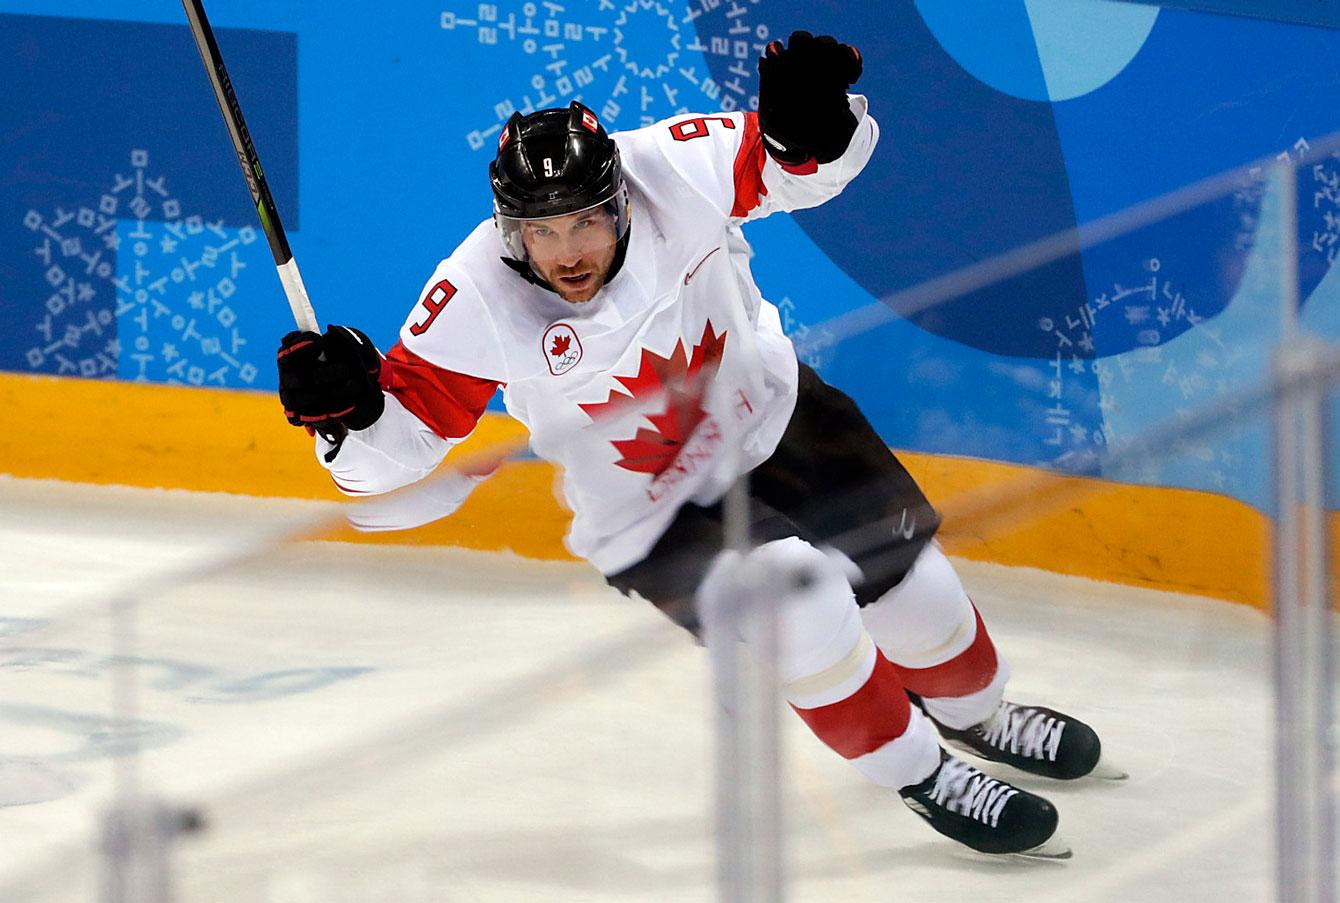 Team Canada Czech Republic Ice Hockey PyeongChang 2018